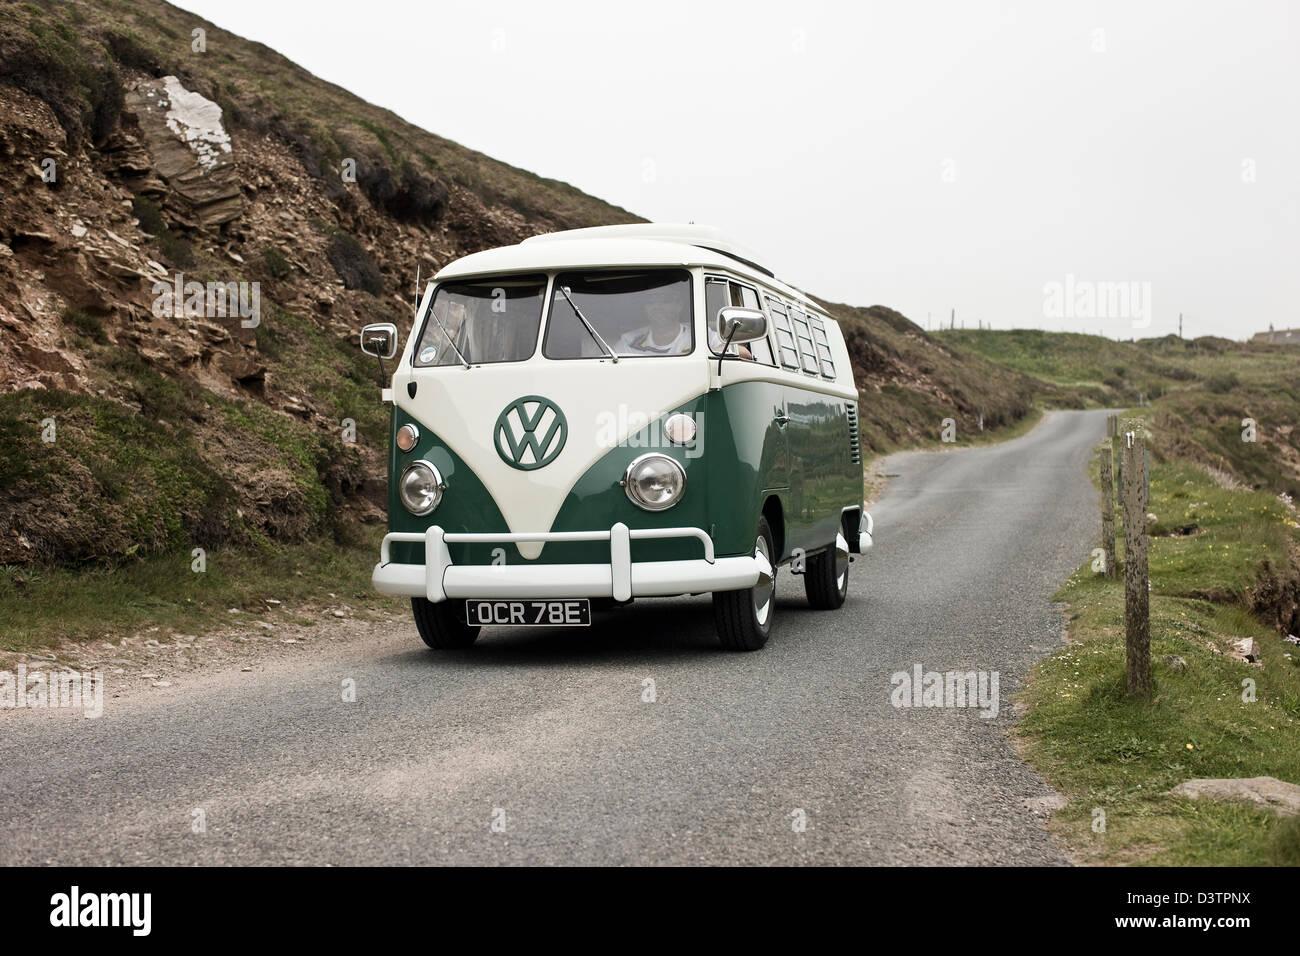 VW campervan on coastal road, St Agnes, Cornwall, UK - Stock Image